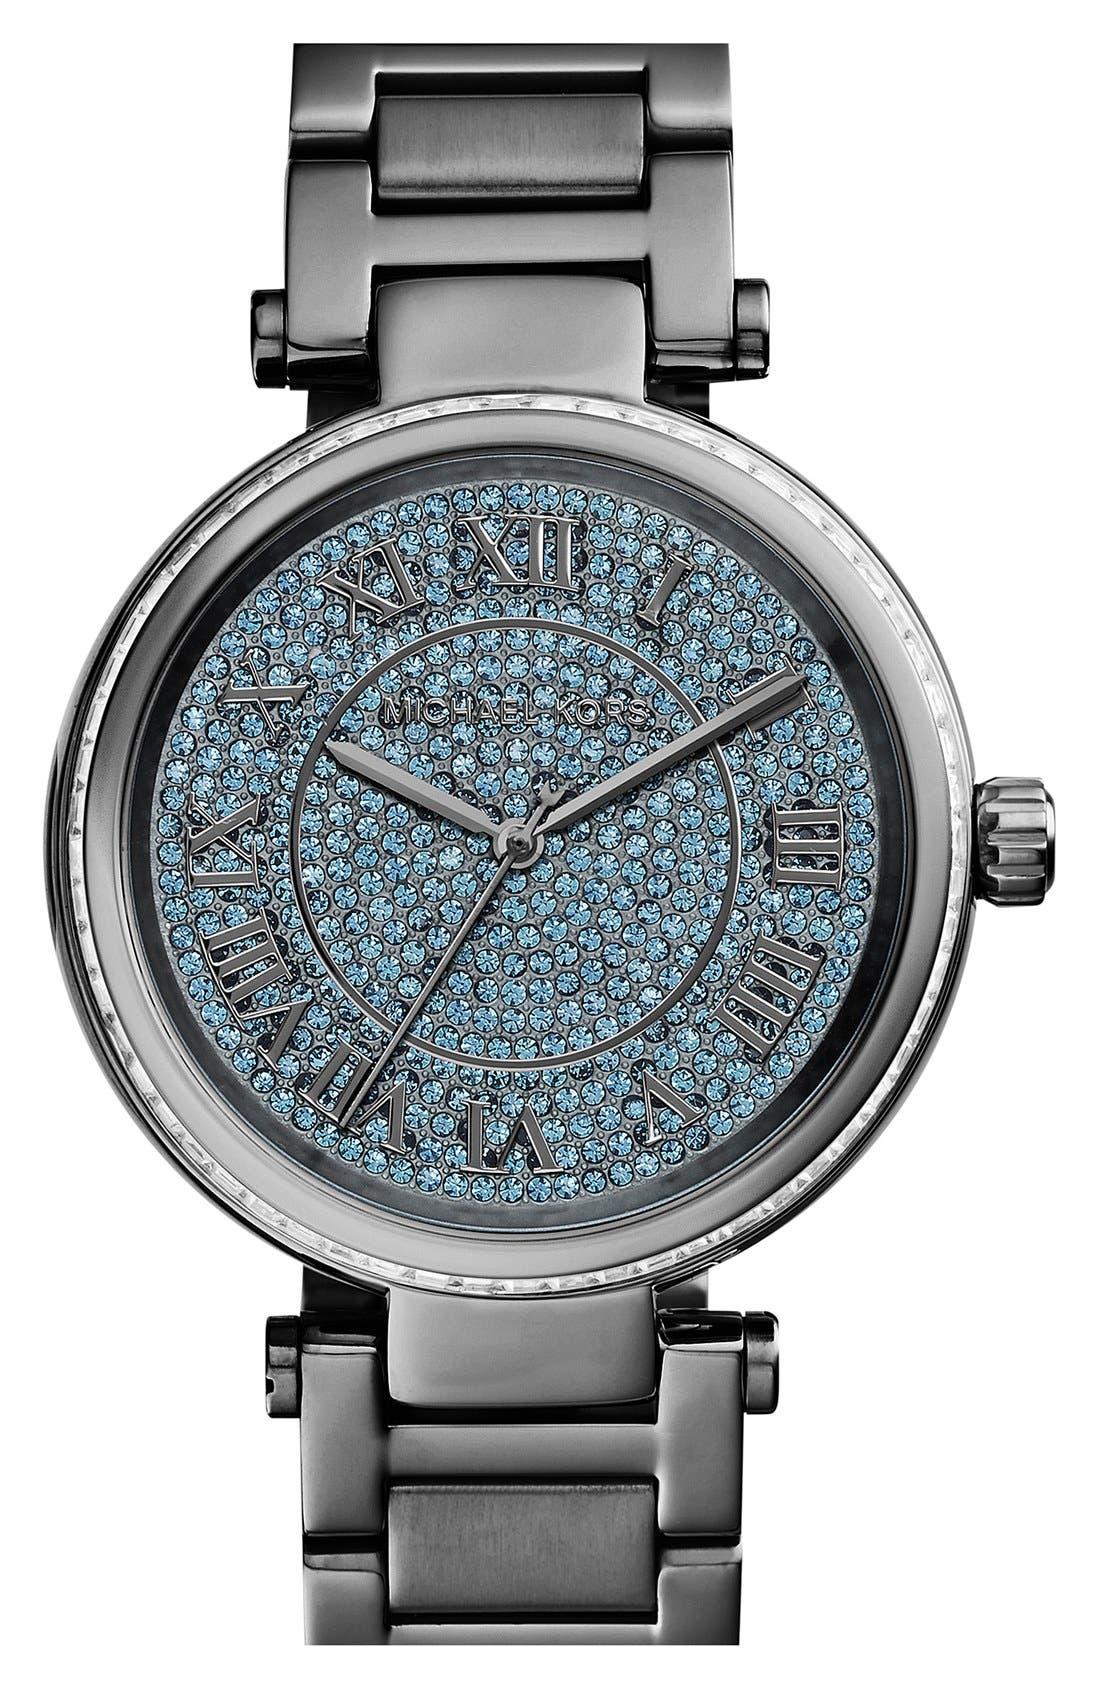 Main Image - Michael Kors 'Skylar' Pavé Dial Crystal Bezel Bracelet Watch, 42mm